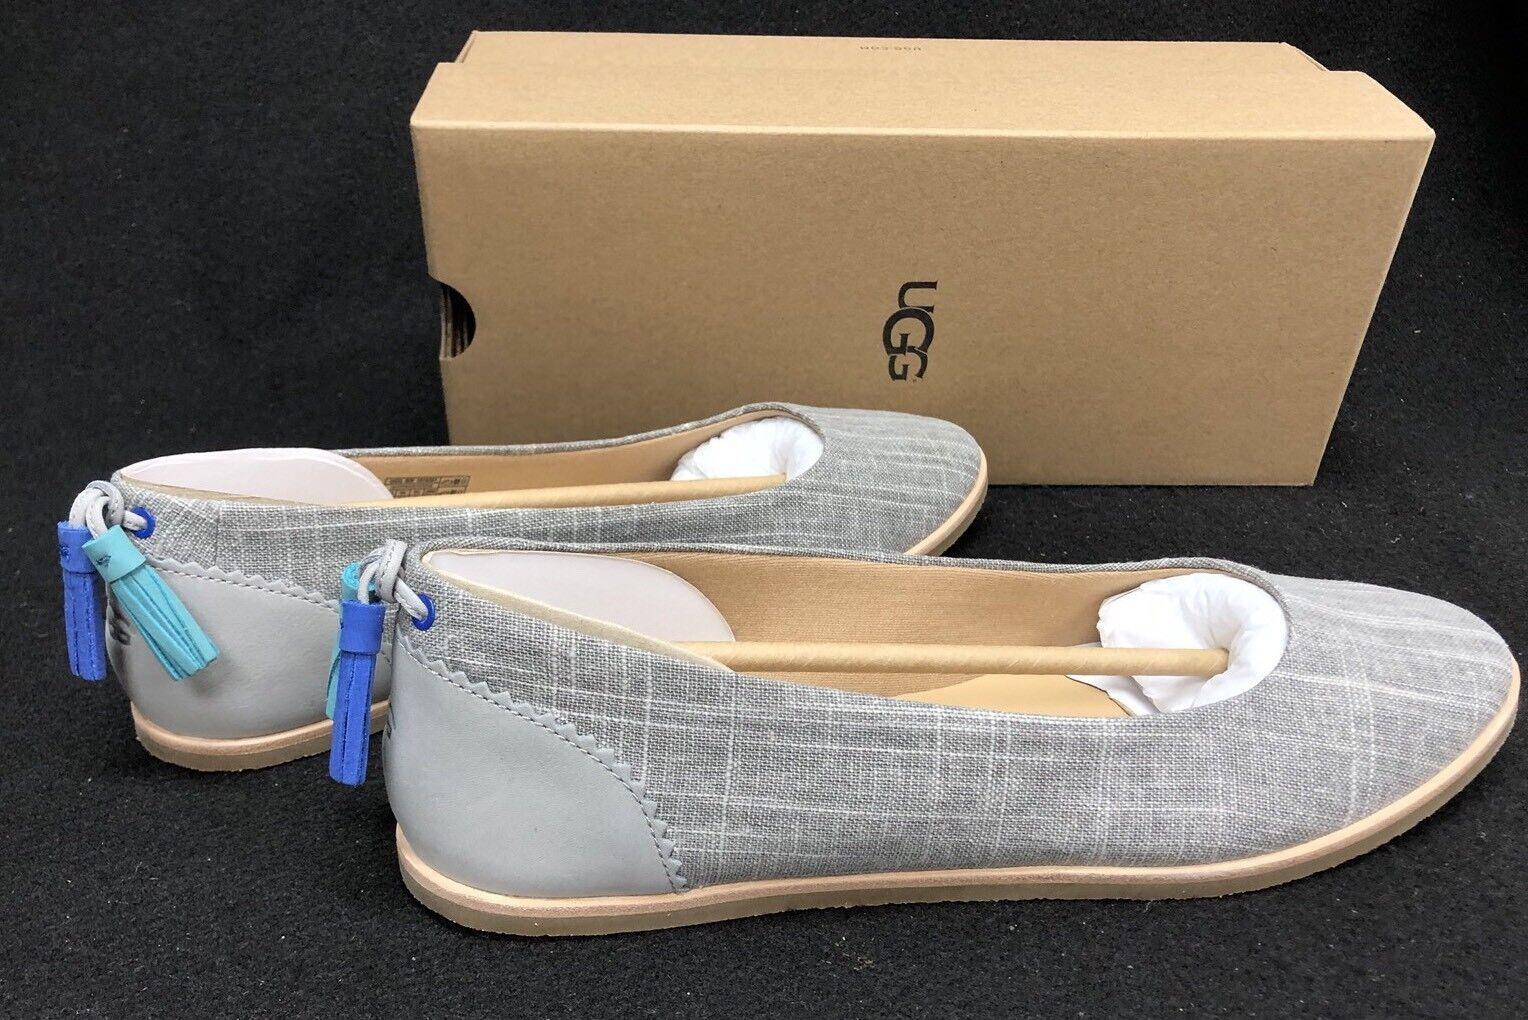 Ugg Australia Mesa Tassel Flats 1018631 Seal Slip On Canvas Nubuck Women's Shoe